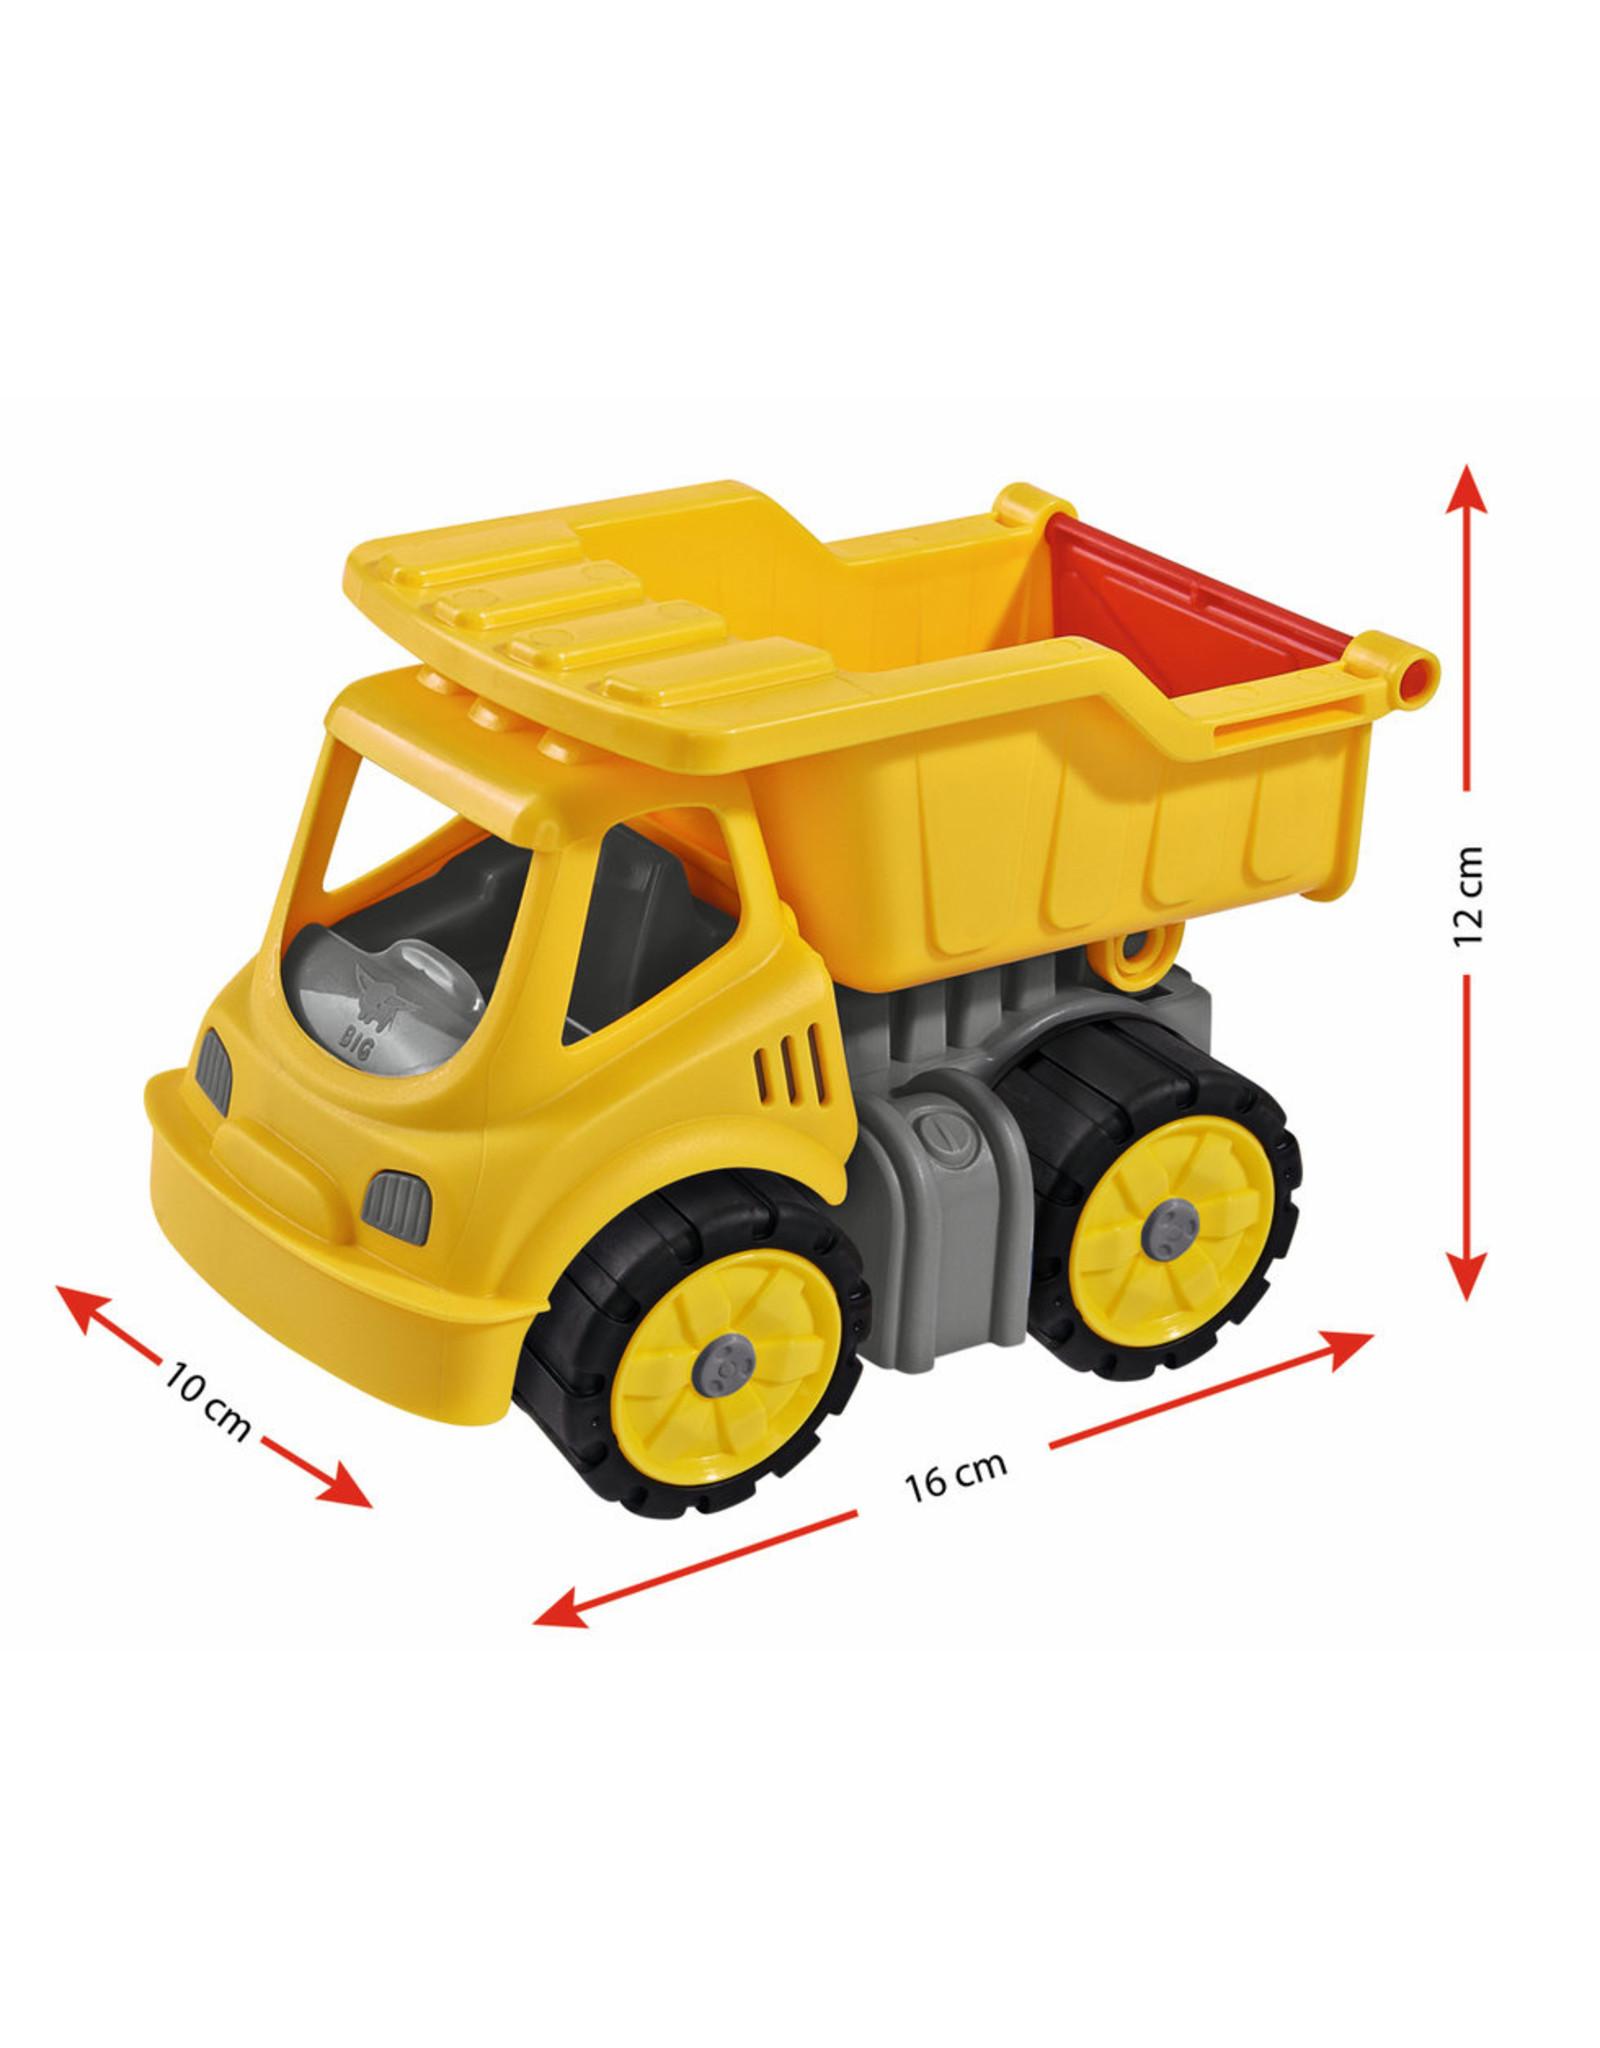 BIG BIG Power Worker mini Strassenbauarbeiten